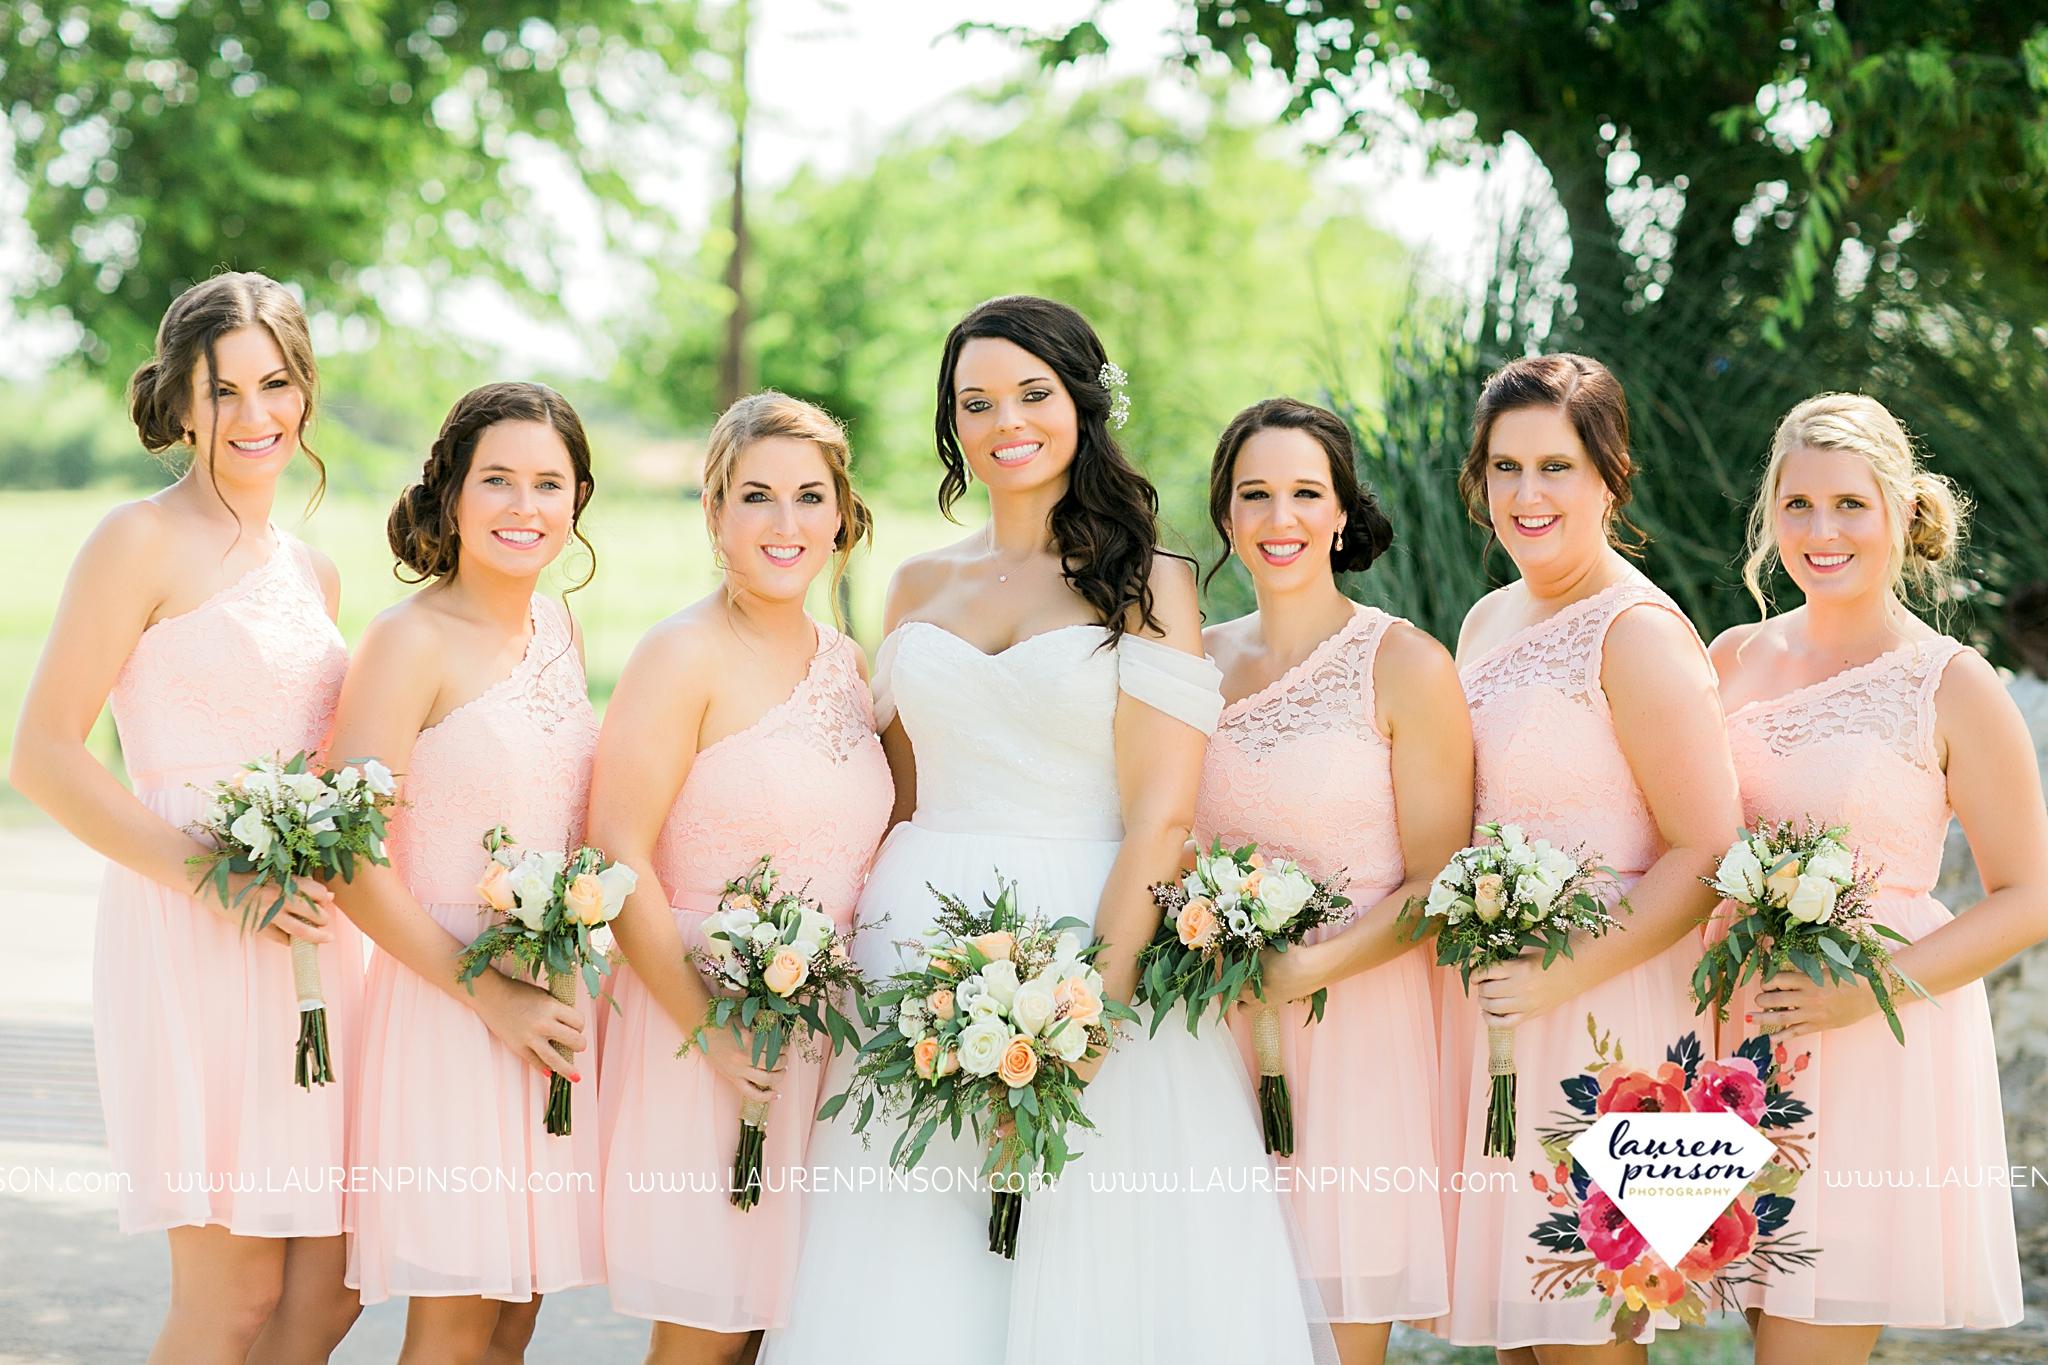 jones-barn-willow-creek-ranch-wedding-in-cleburne-texas-fort-worth-dfw-wichita-falls-wedding-photography_3213.jpg